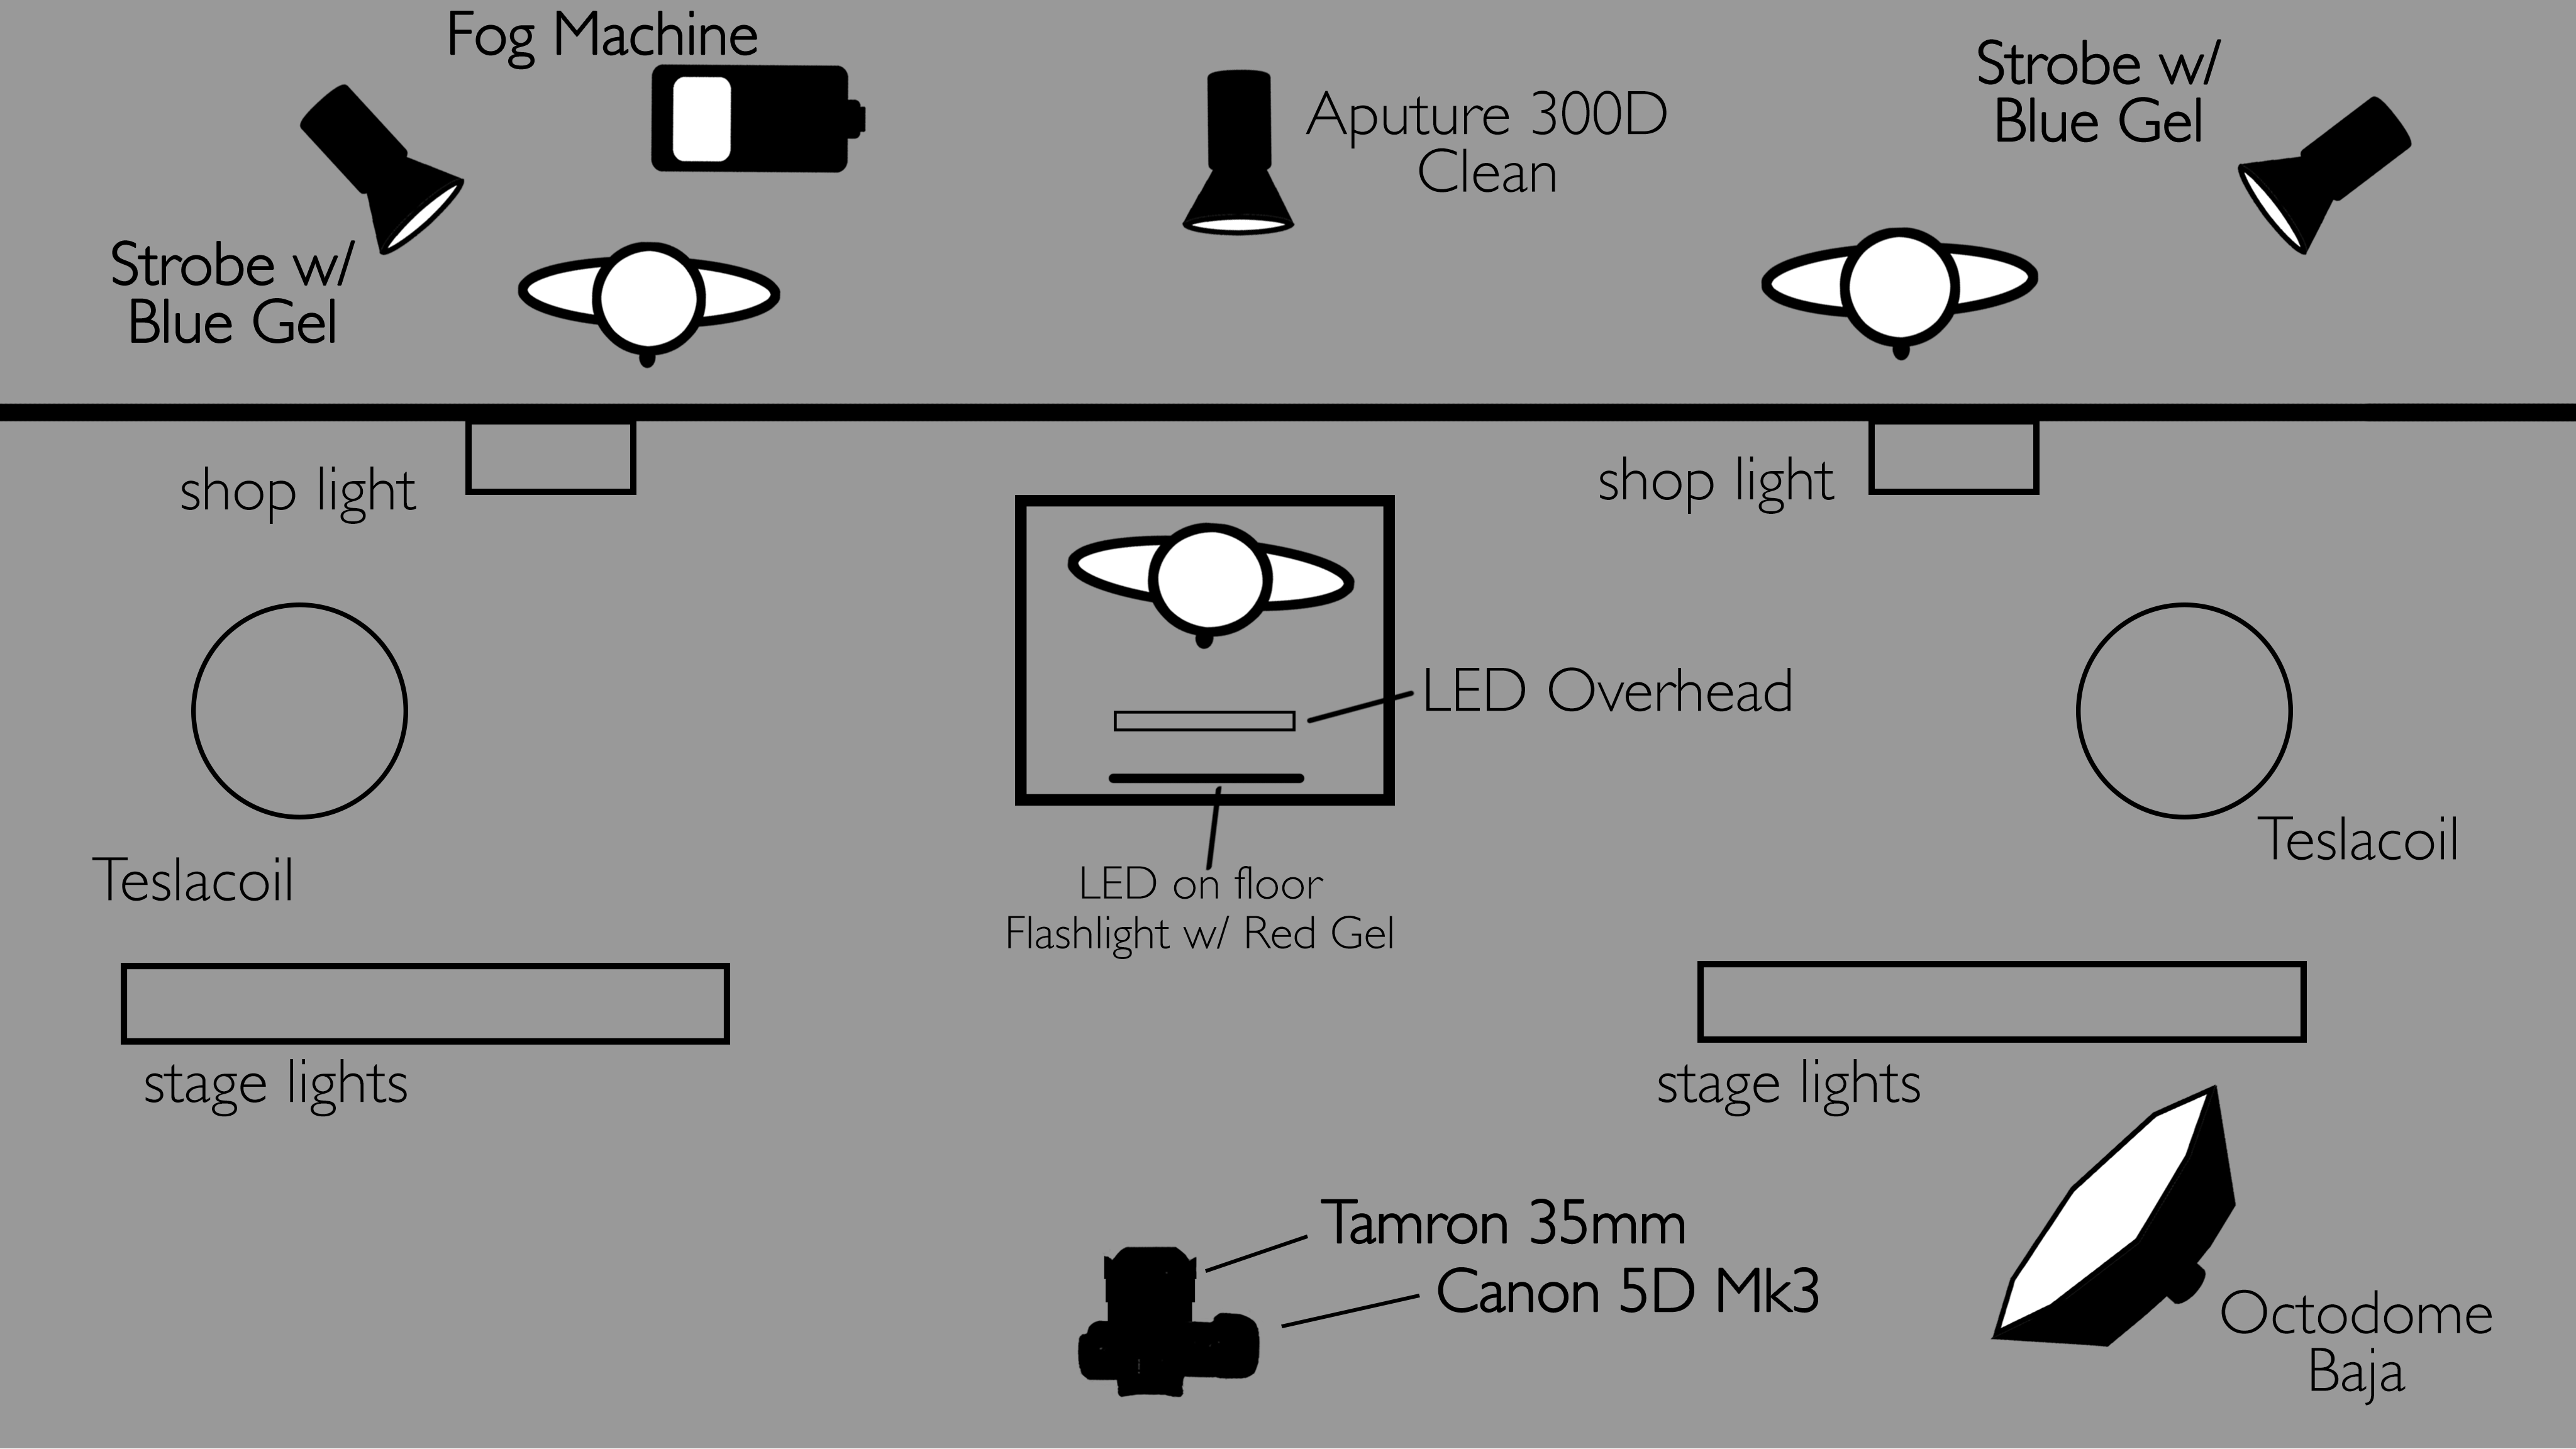 Sensational Wiring Diagram Bmw 7 Series Interior Yy50Qt 6 Wiring Diagram Honda Wiring Cloud Ittabisraaidewilluminateatxorg